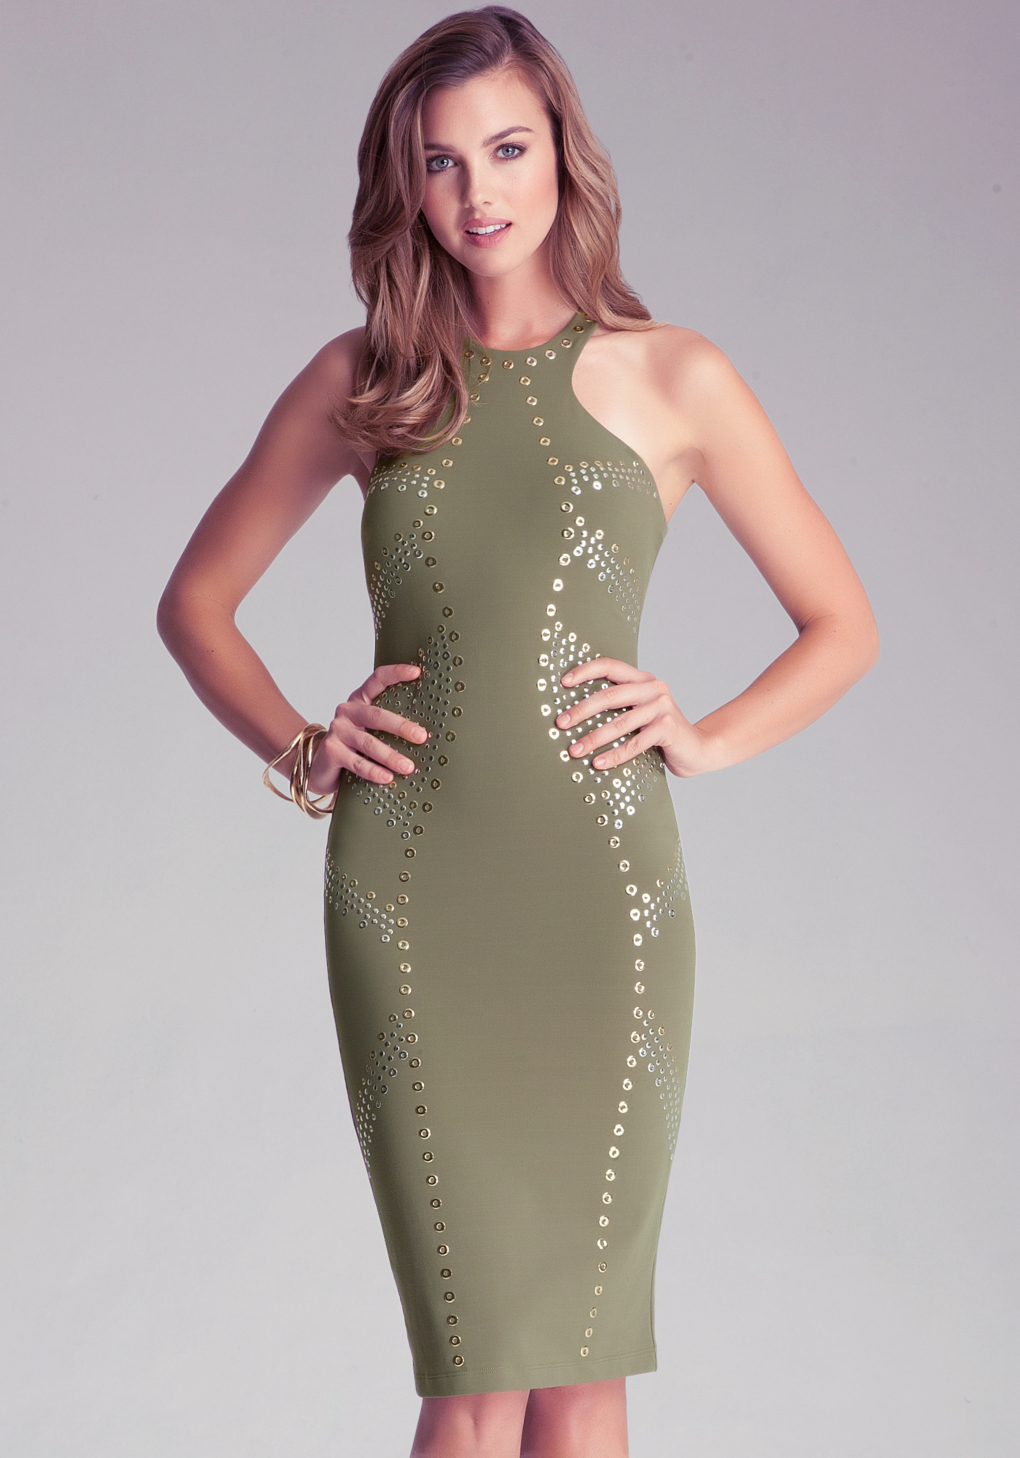 Bebe Green Racerfront Studded Dress Lyst